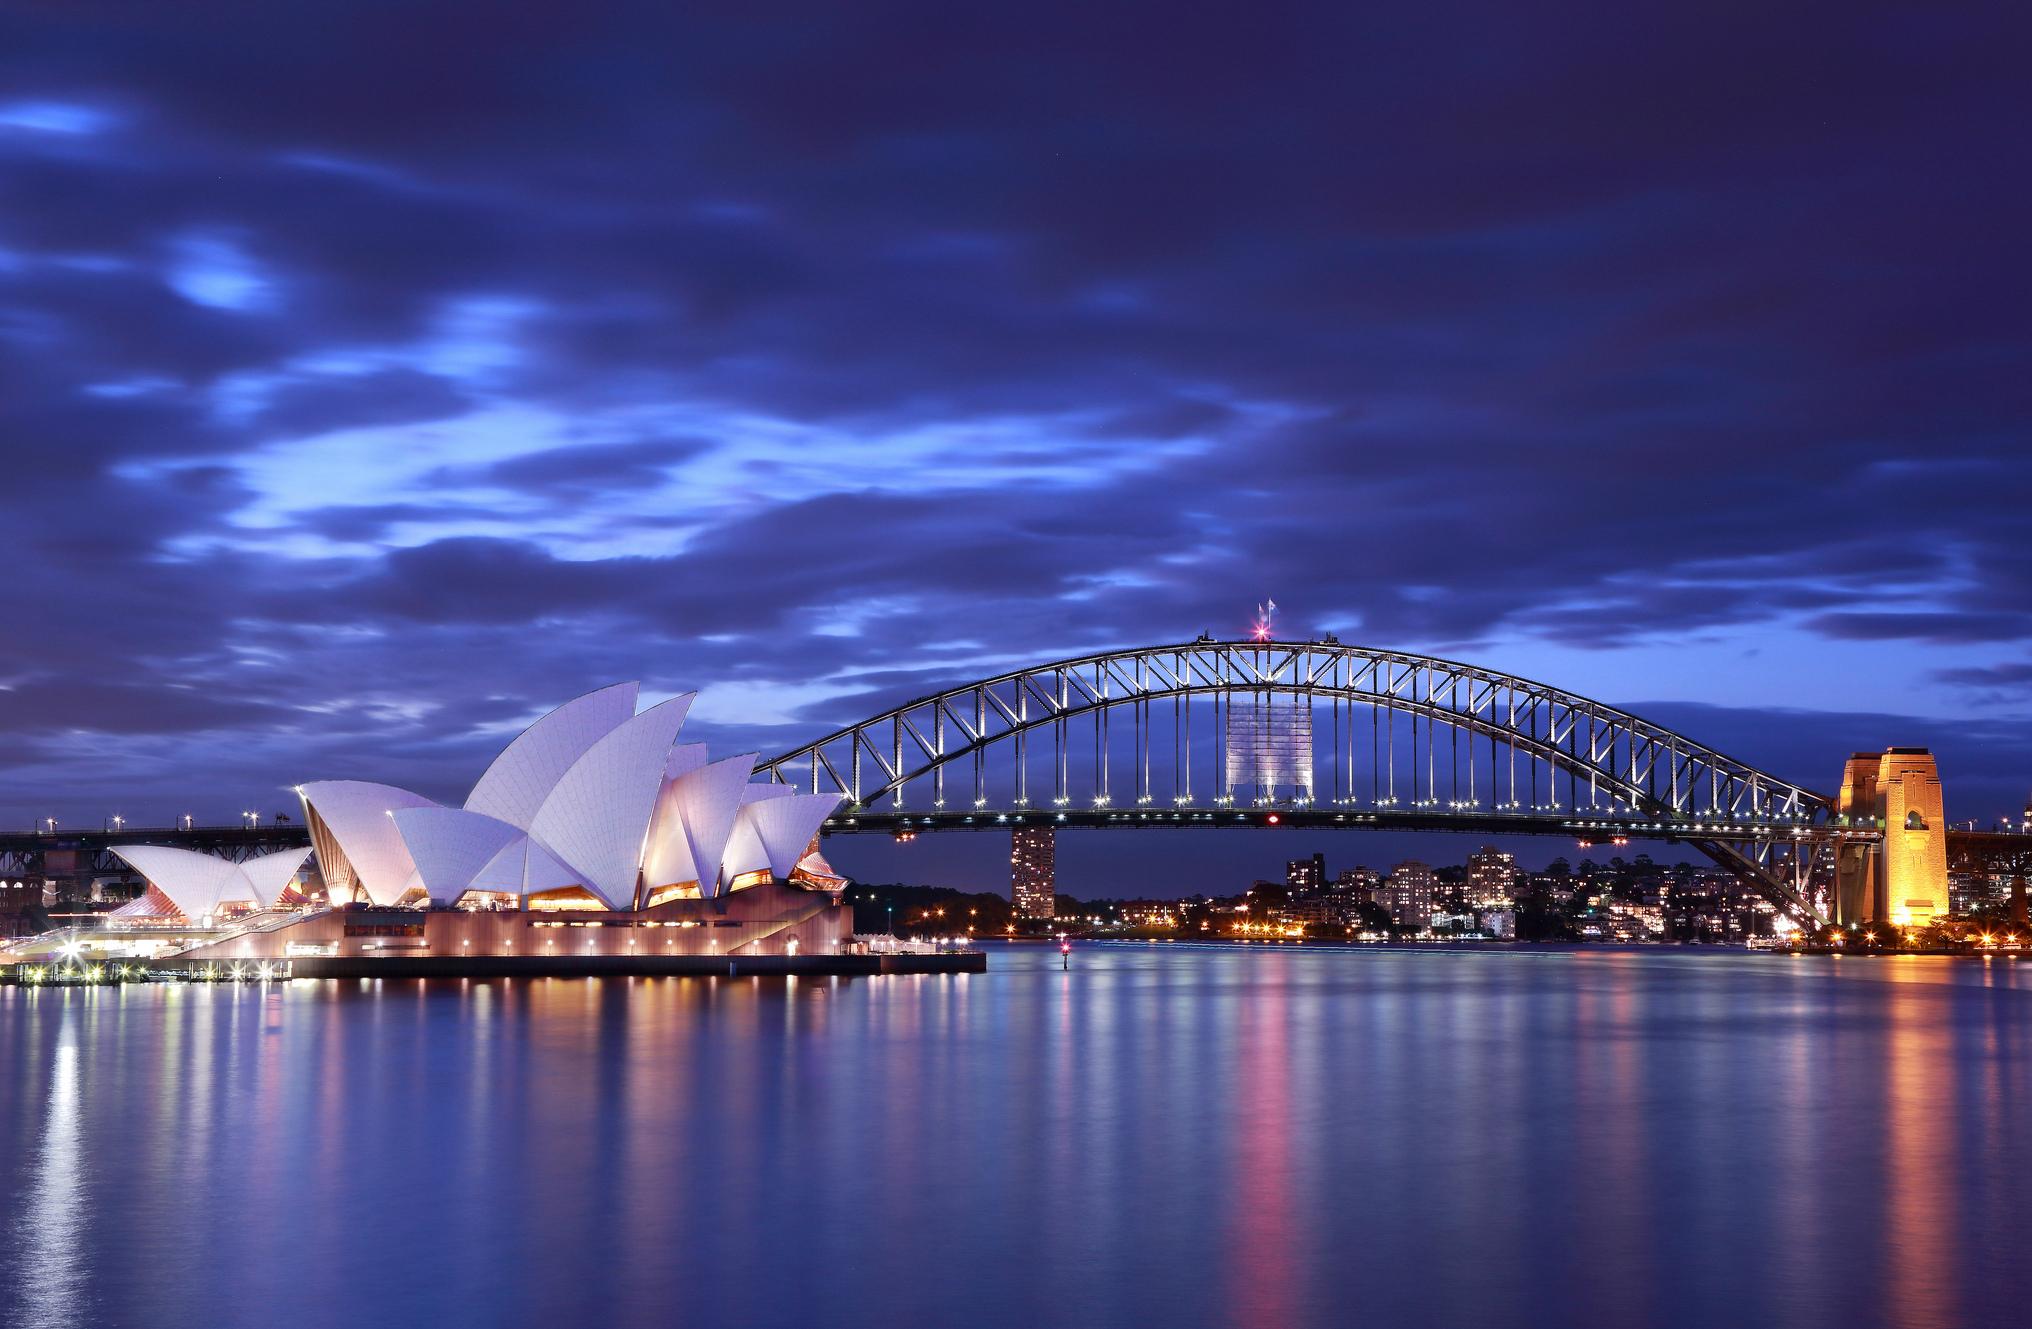 Sydney Harbour Bridge Hd Wallpaper Background Image 2032x1329